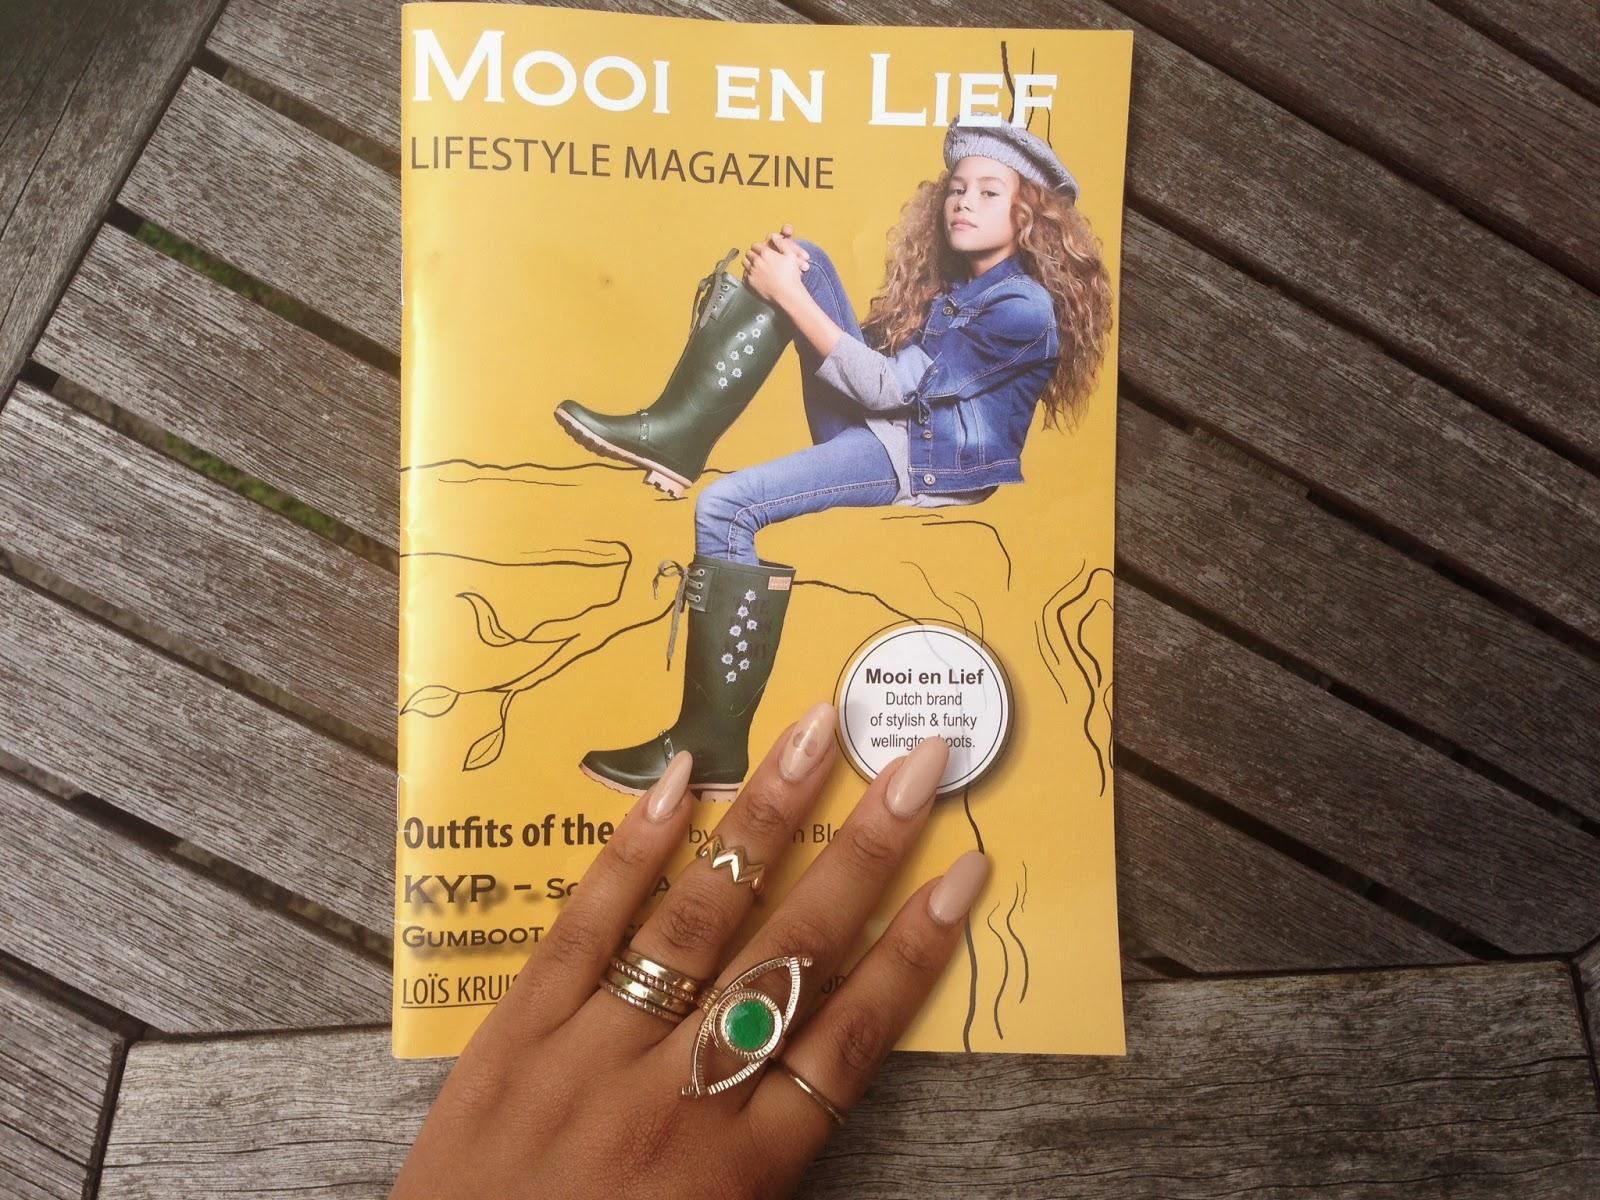 Mooi en Lief Lifestyle Magazine